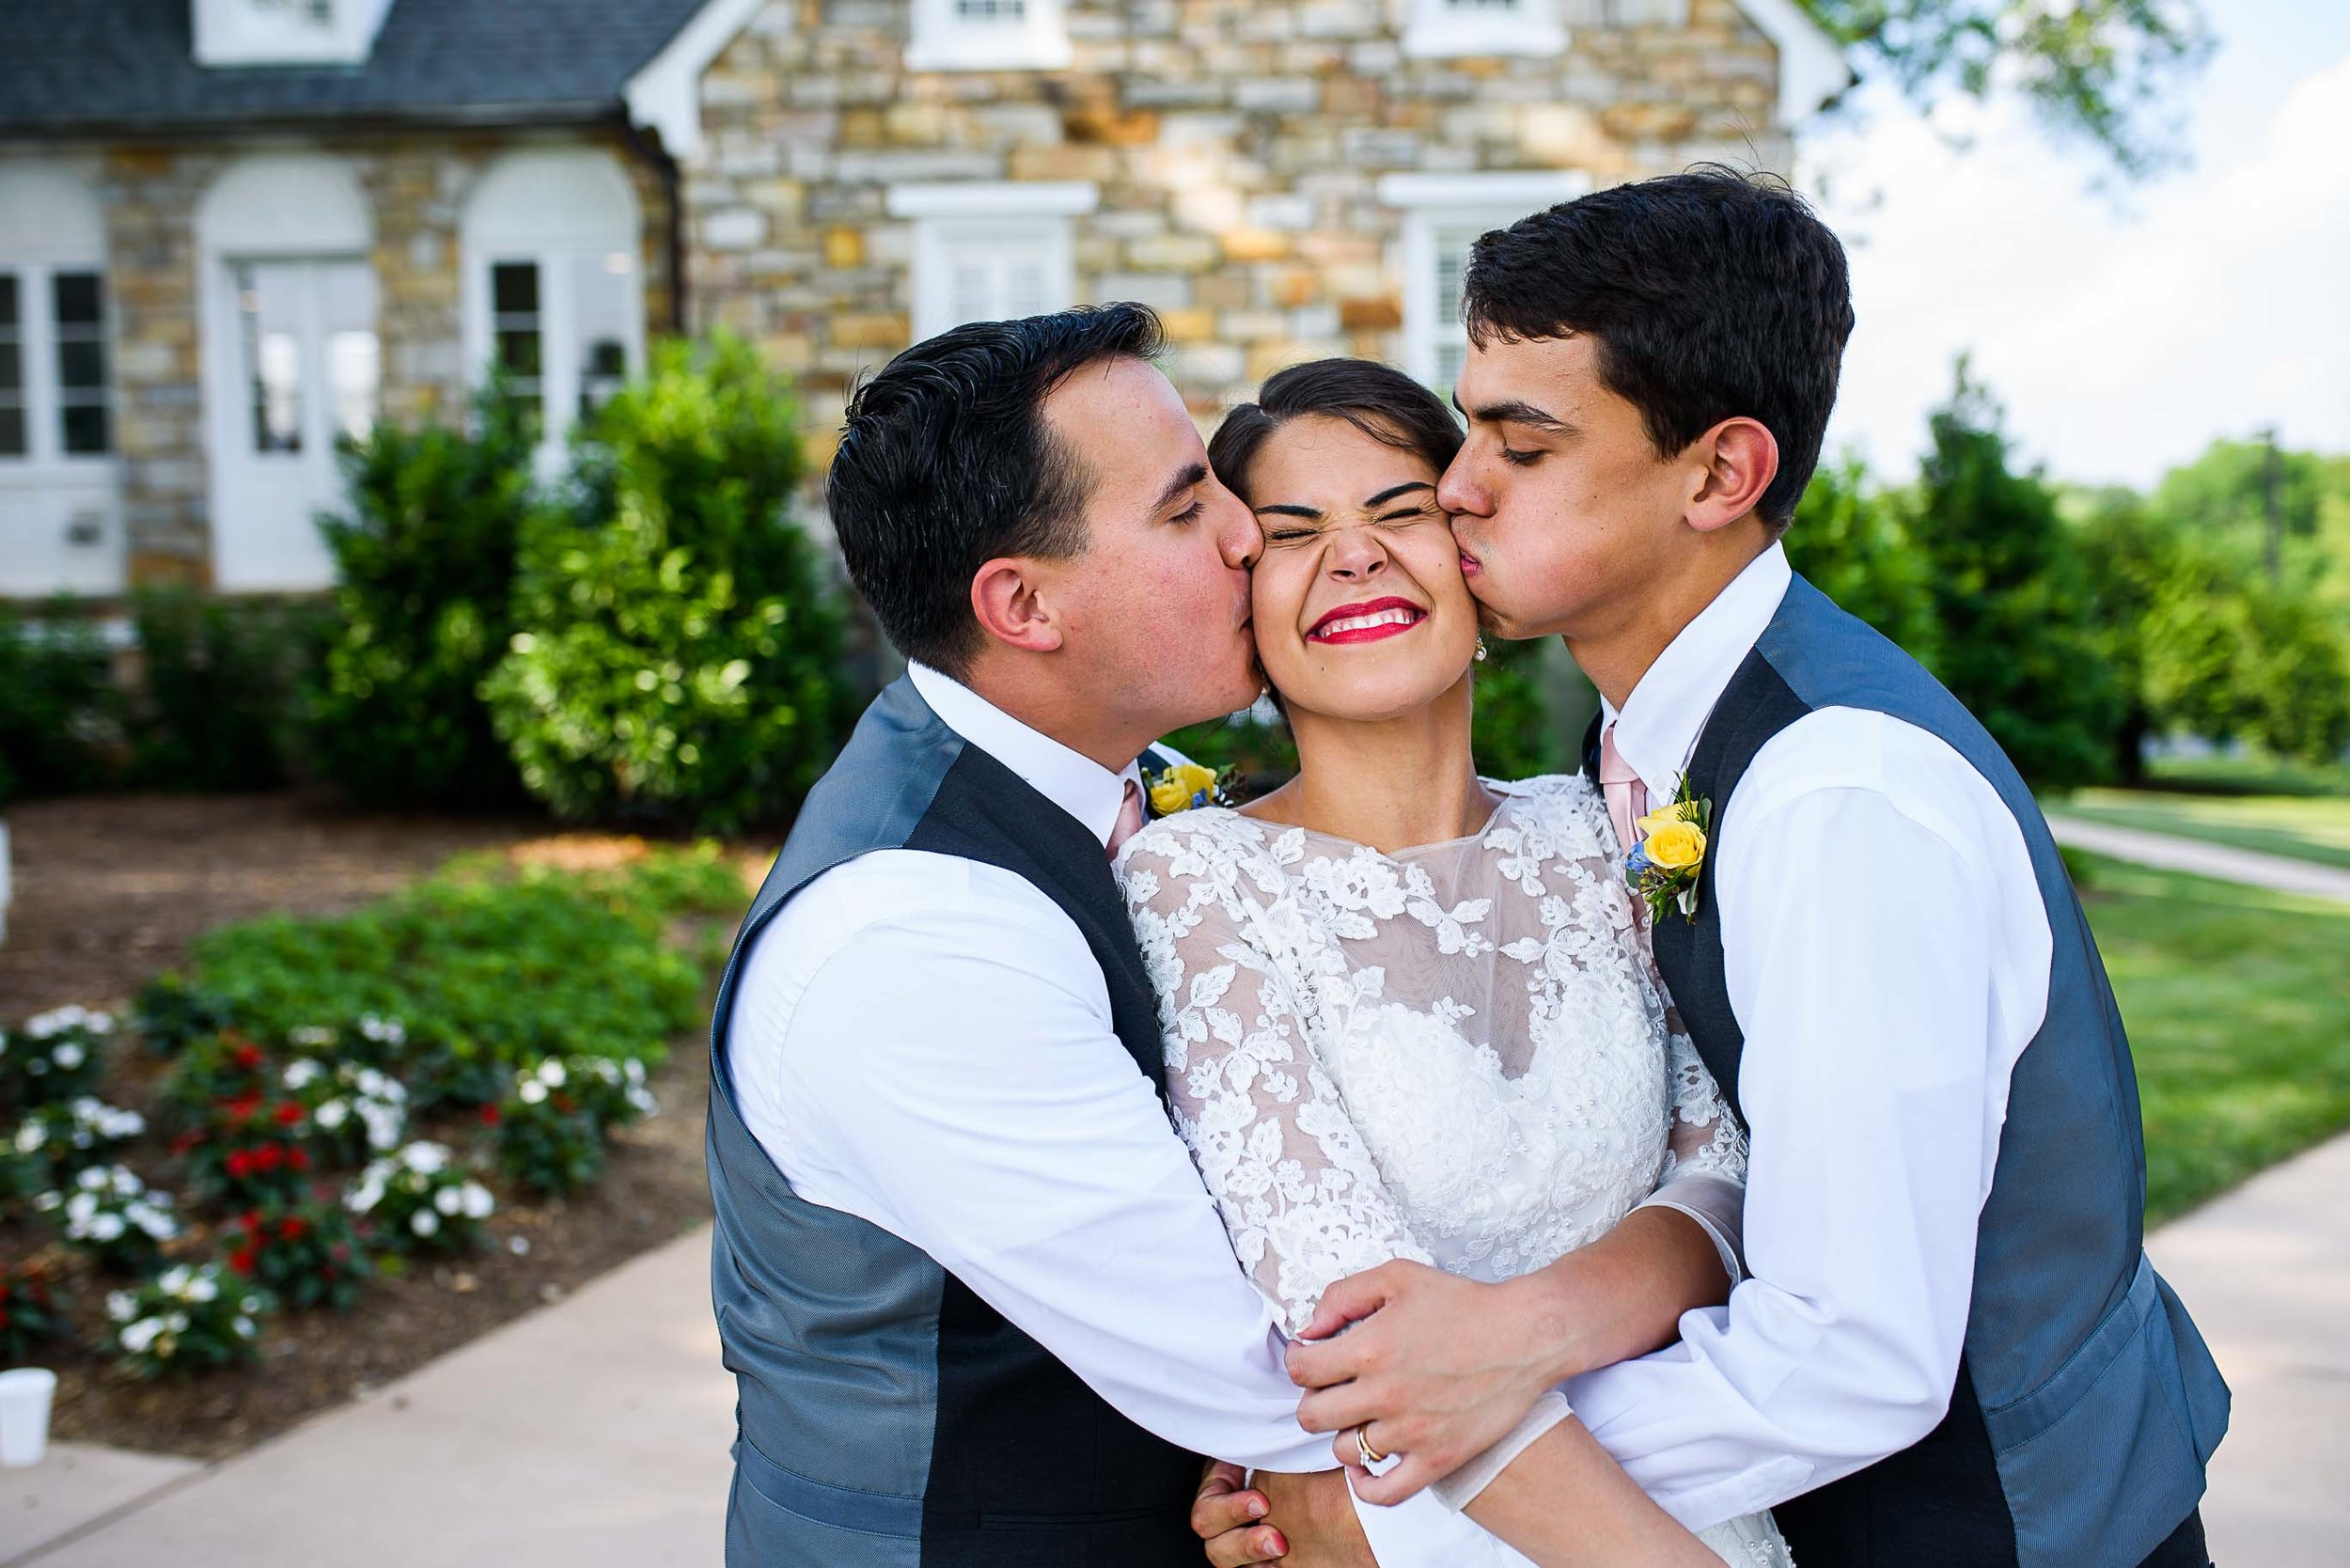 Evergreen Country Club wedding photos55.jpg